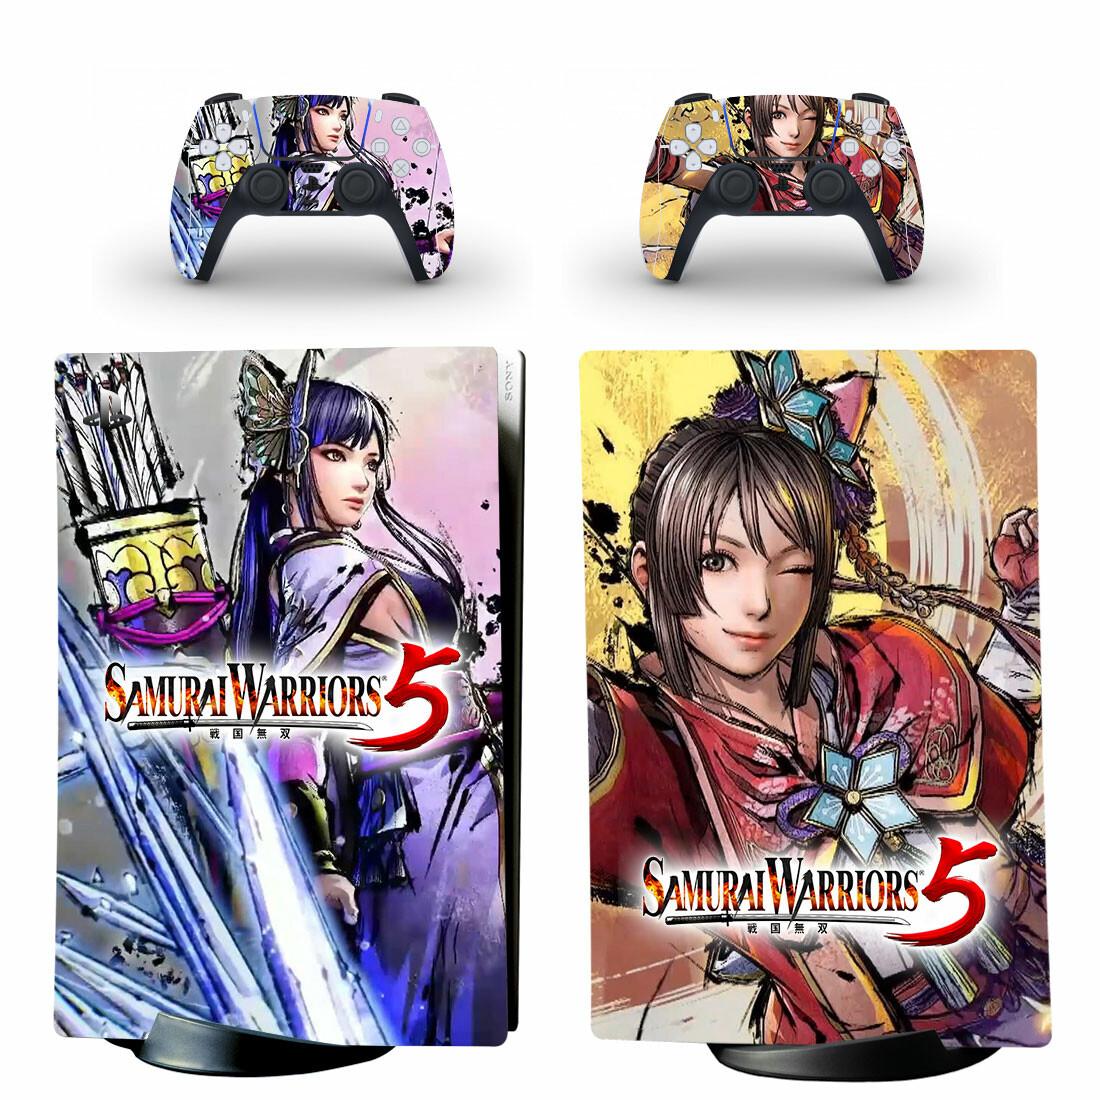 Samurai Warriors 5 PS5 Digital Edition Skin Sticker Decal